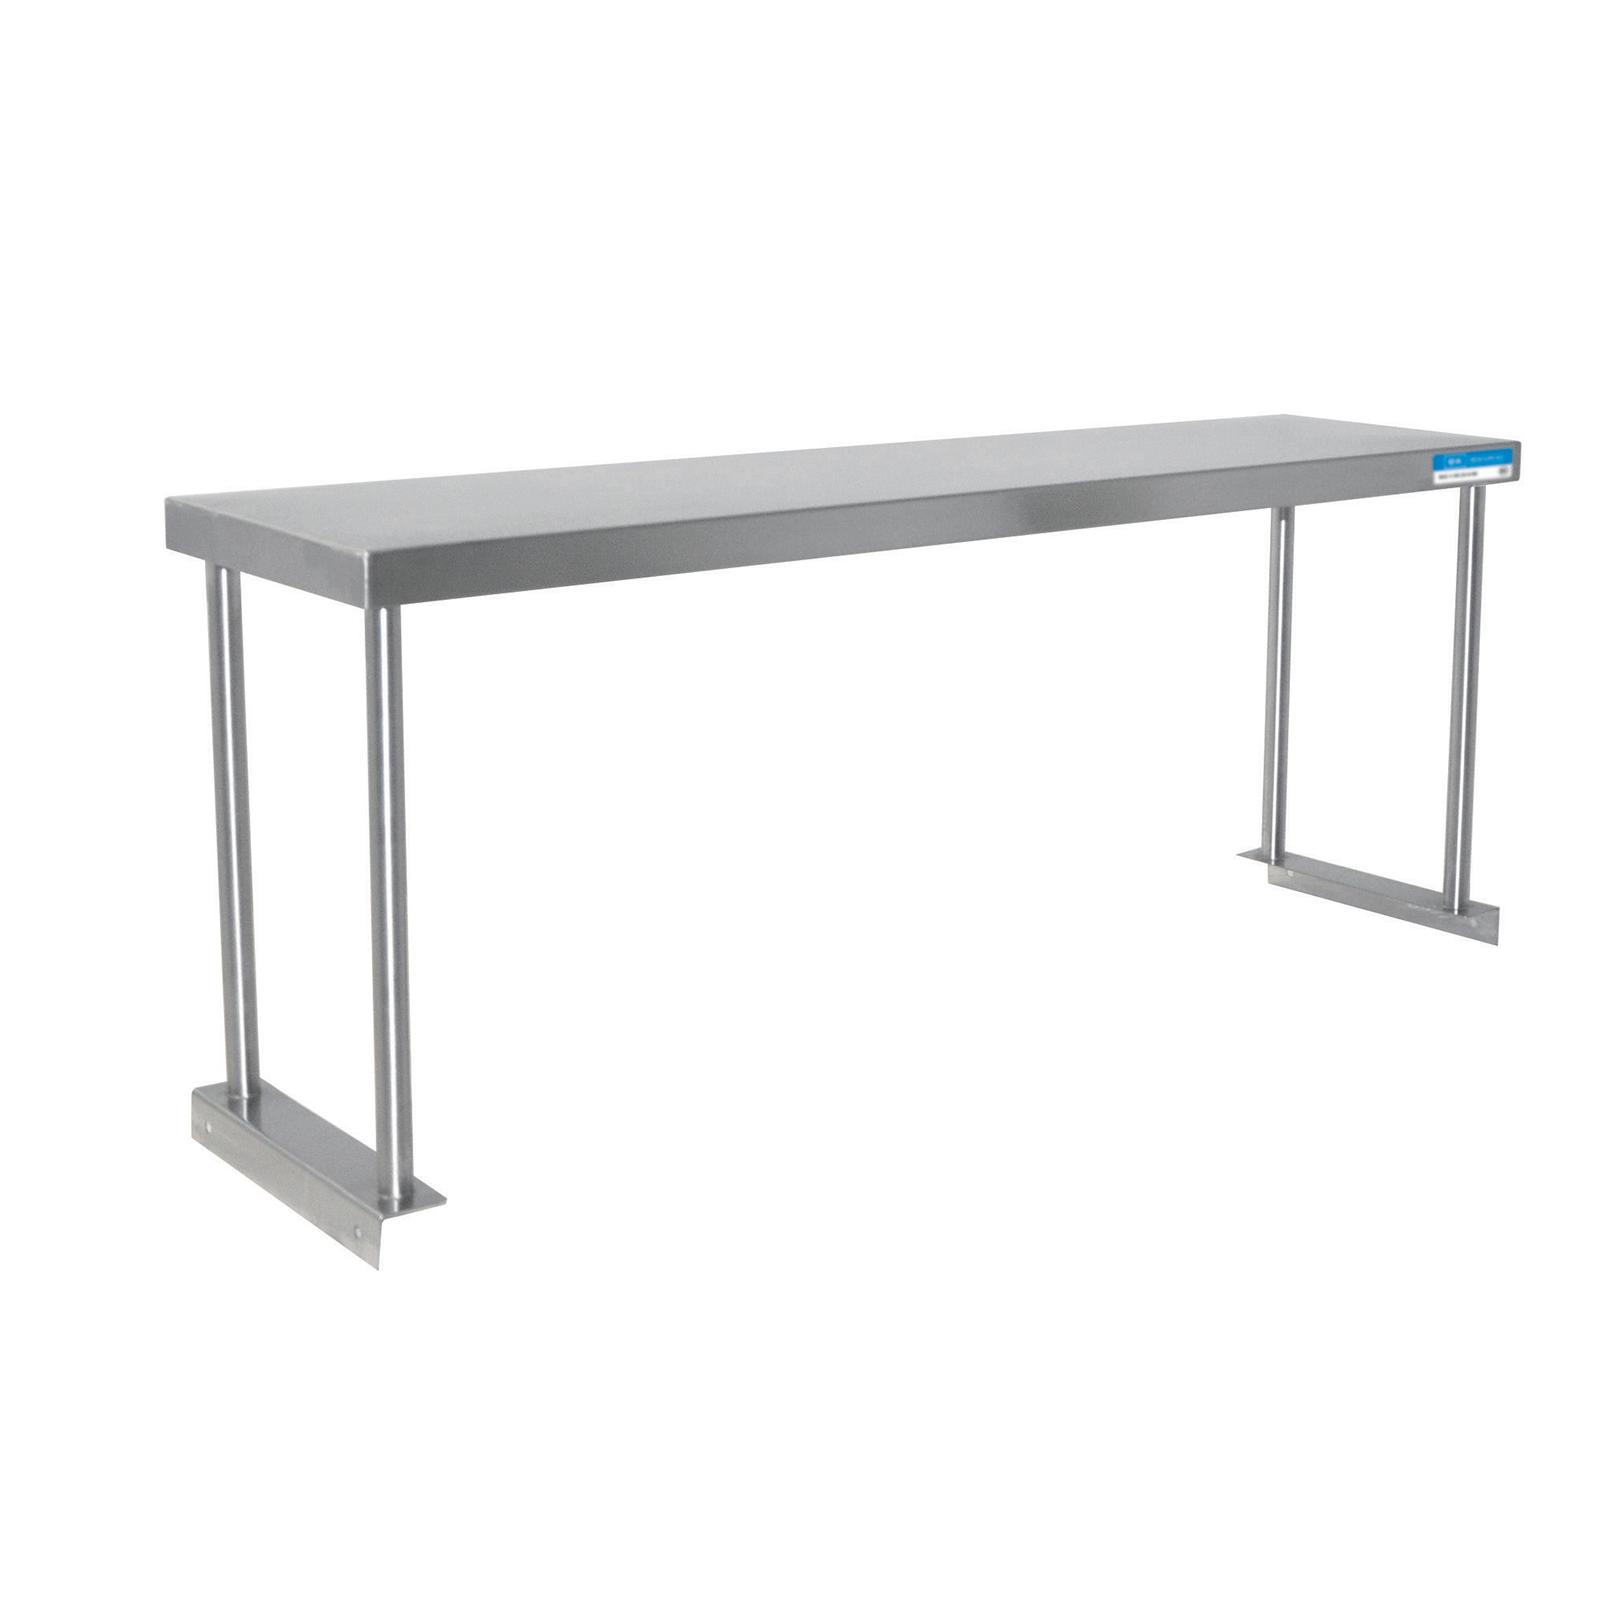 BK Resources BK-OSS-1836 overshelf, table-mounted